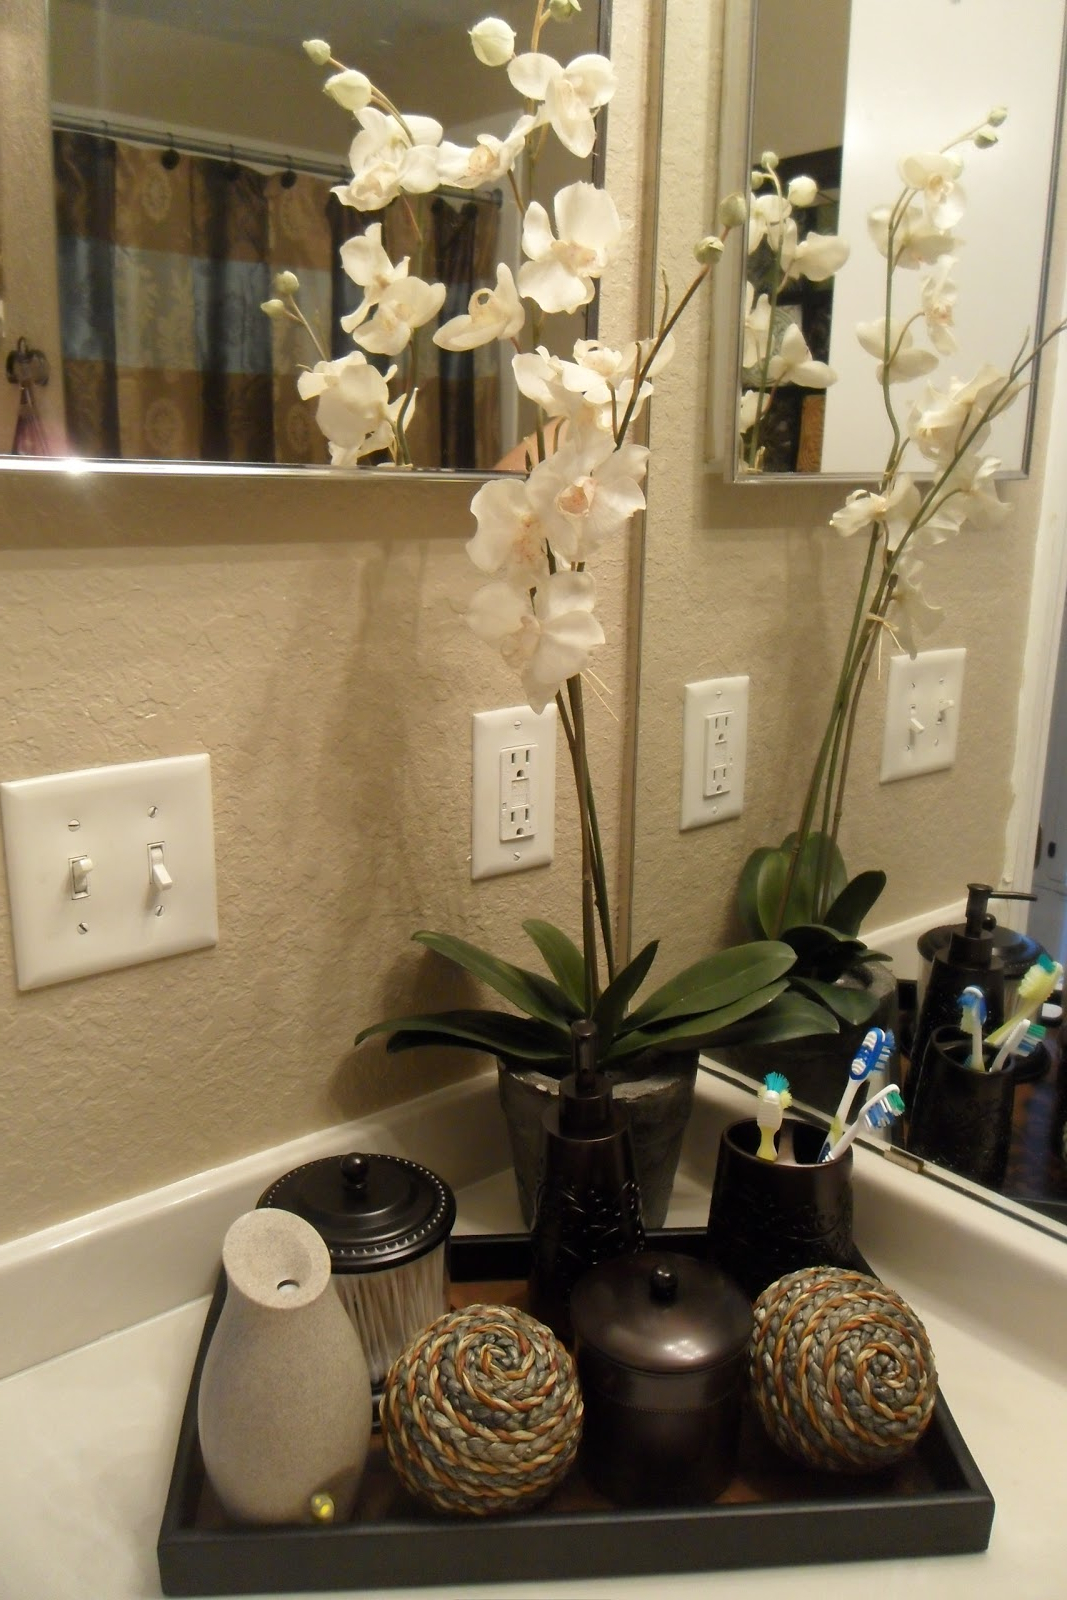 7 Unique Bathroom Decor Ideas